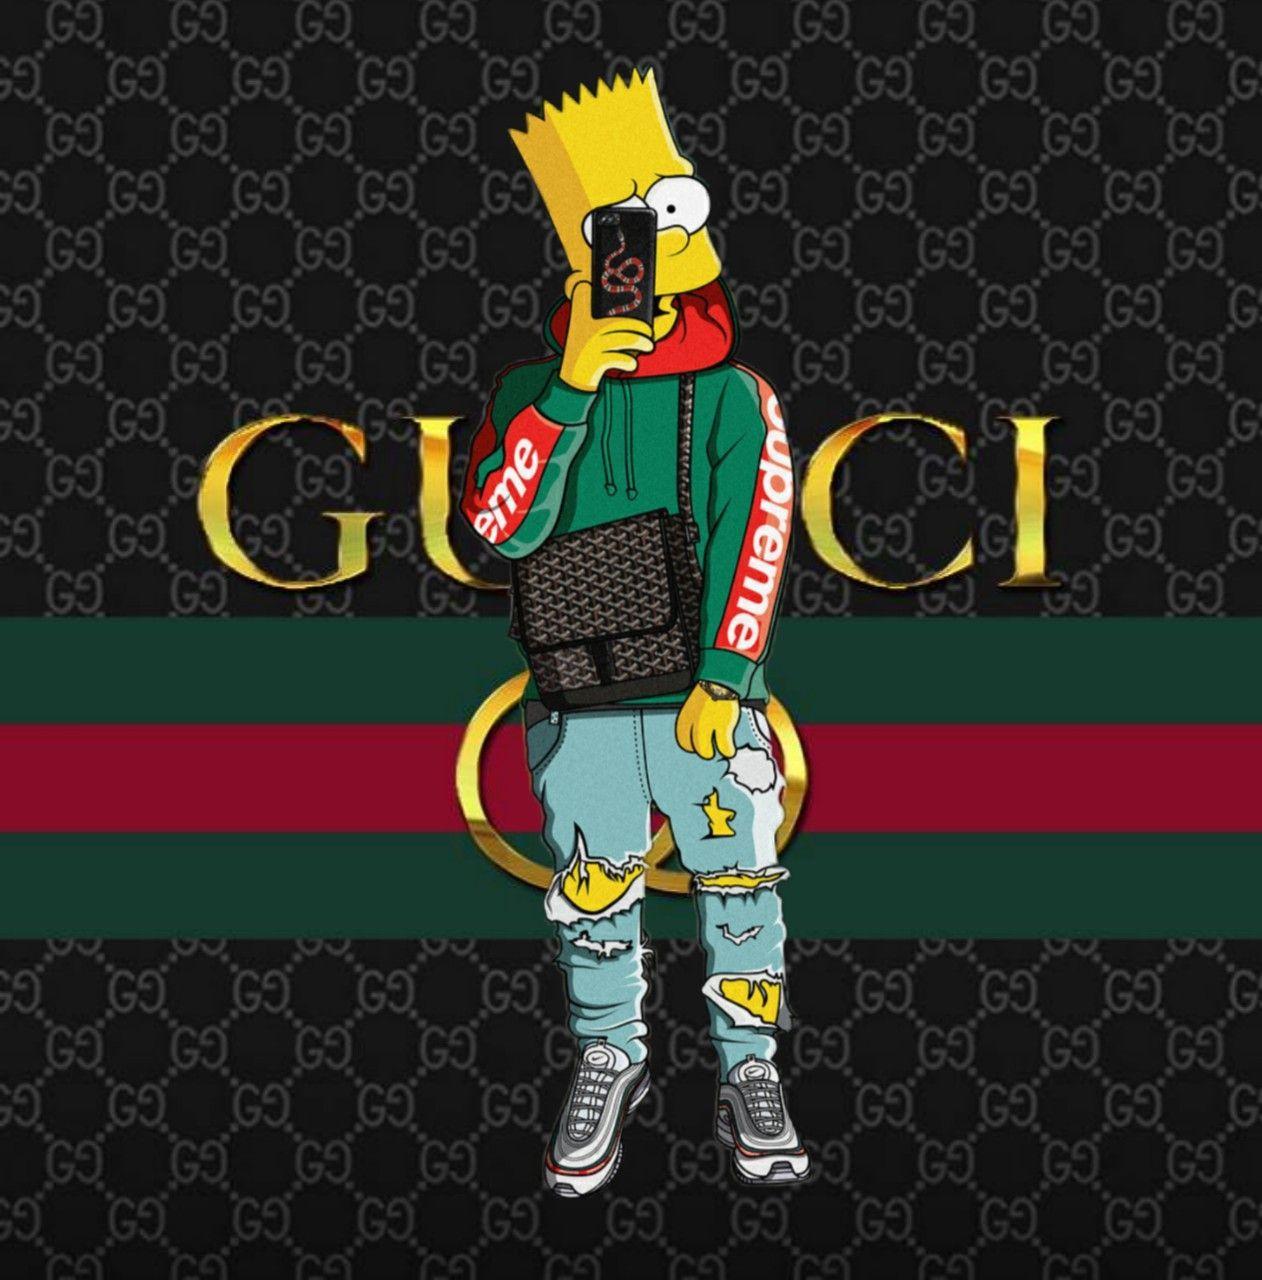 Bart Simpson Gucci X Supreme X Nike Air Max In 2020 Supreme Iphone Wallpaper Simpson Wallpaper Iphone Swag Wallpaper